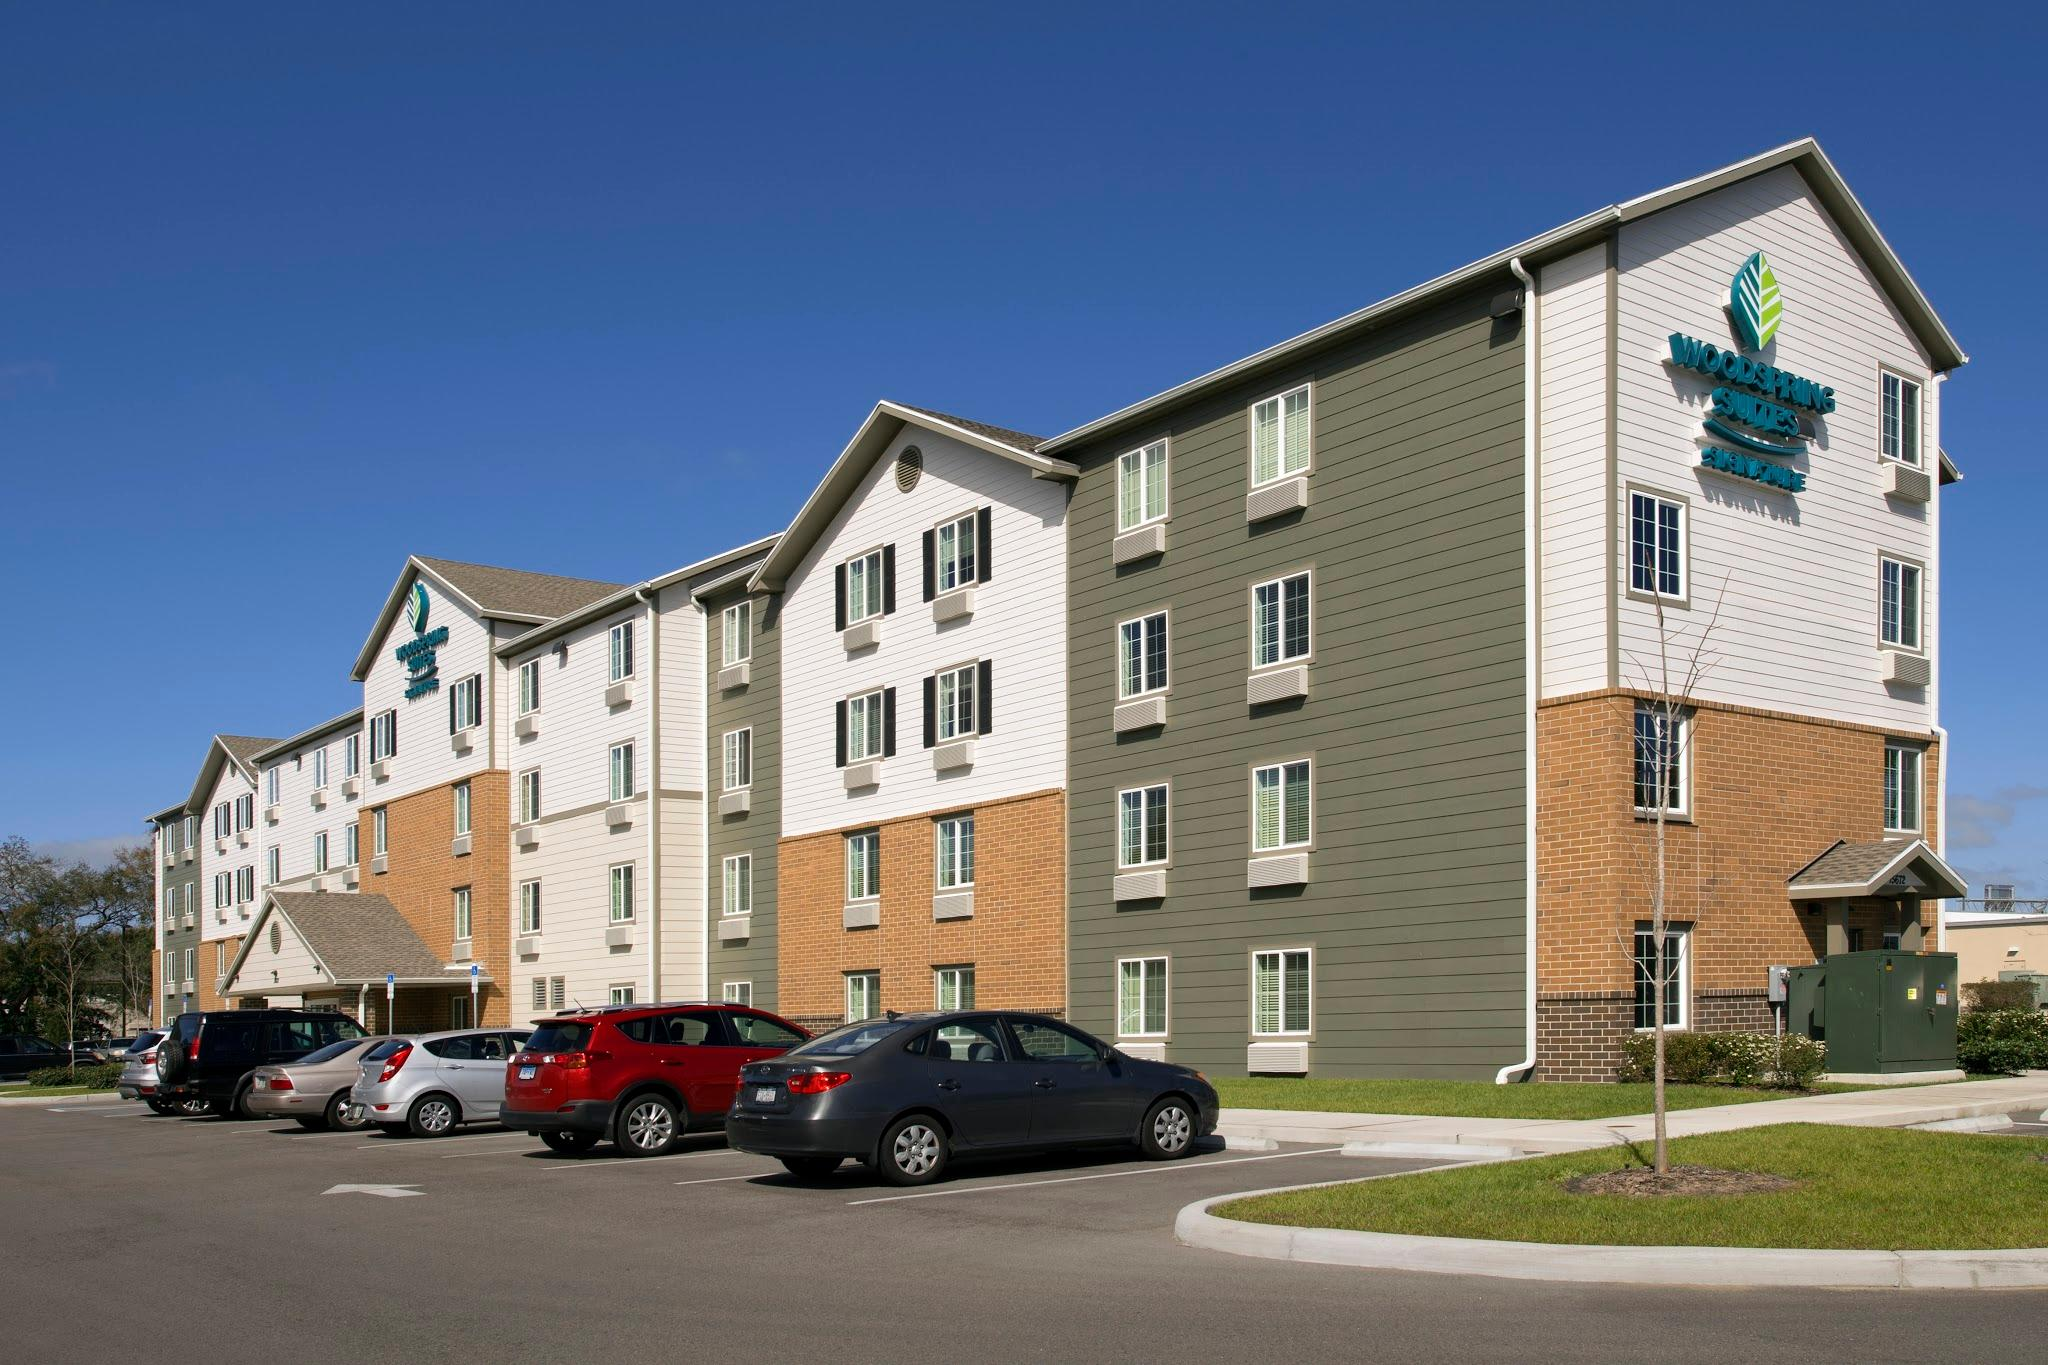 WoodSpring Suites Clearwater image 5